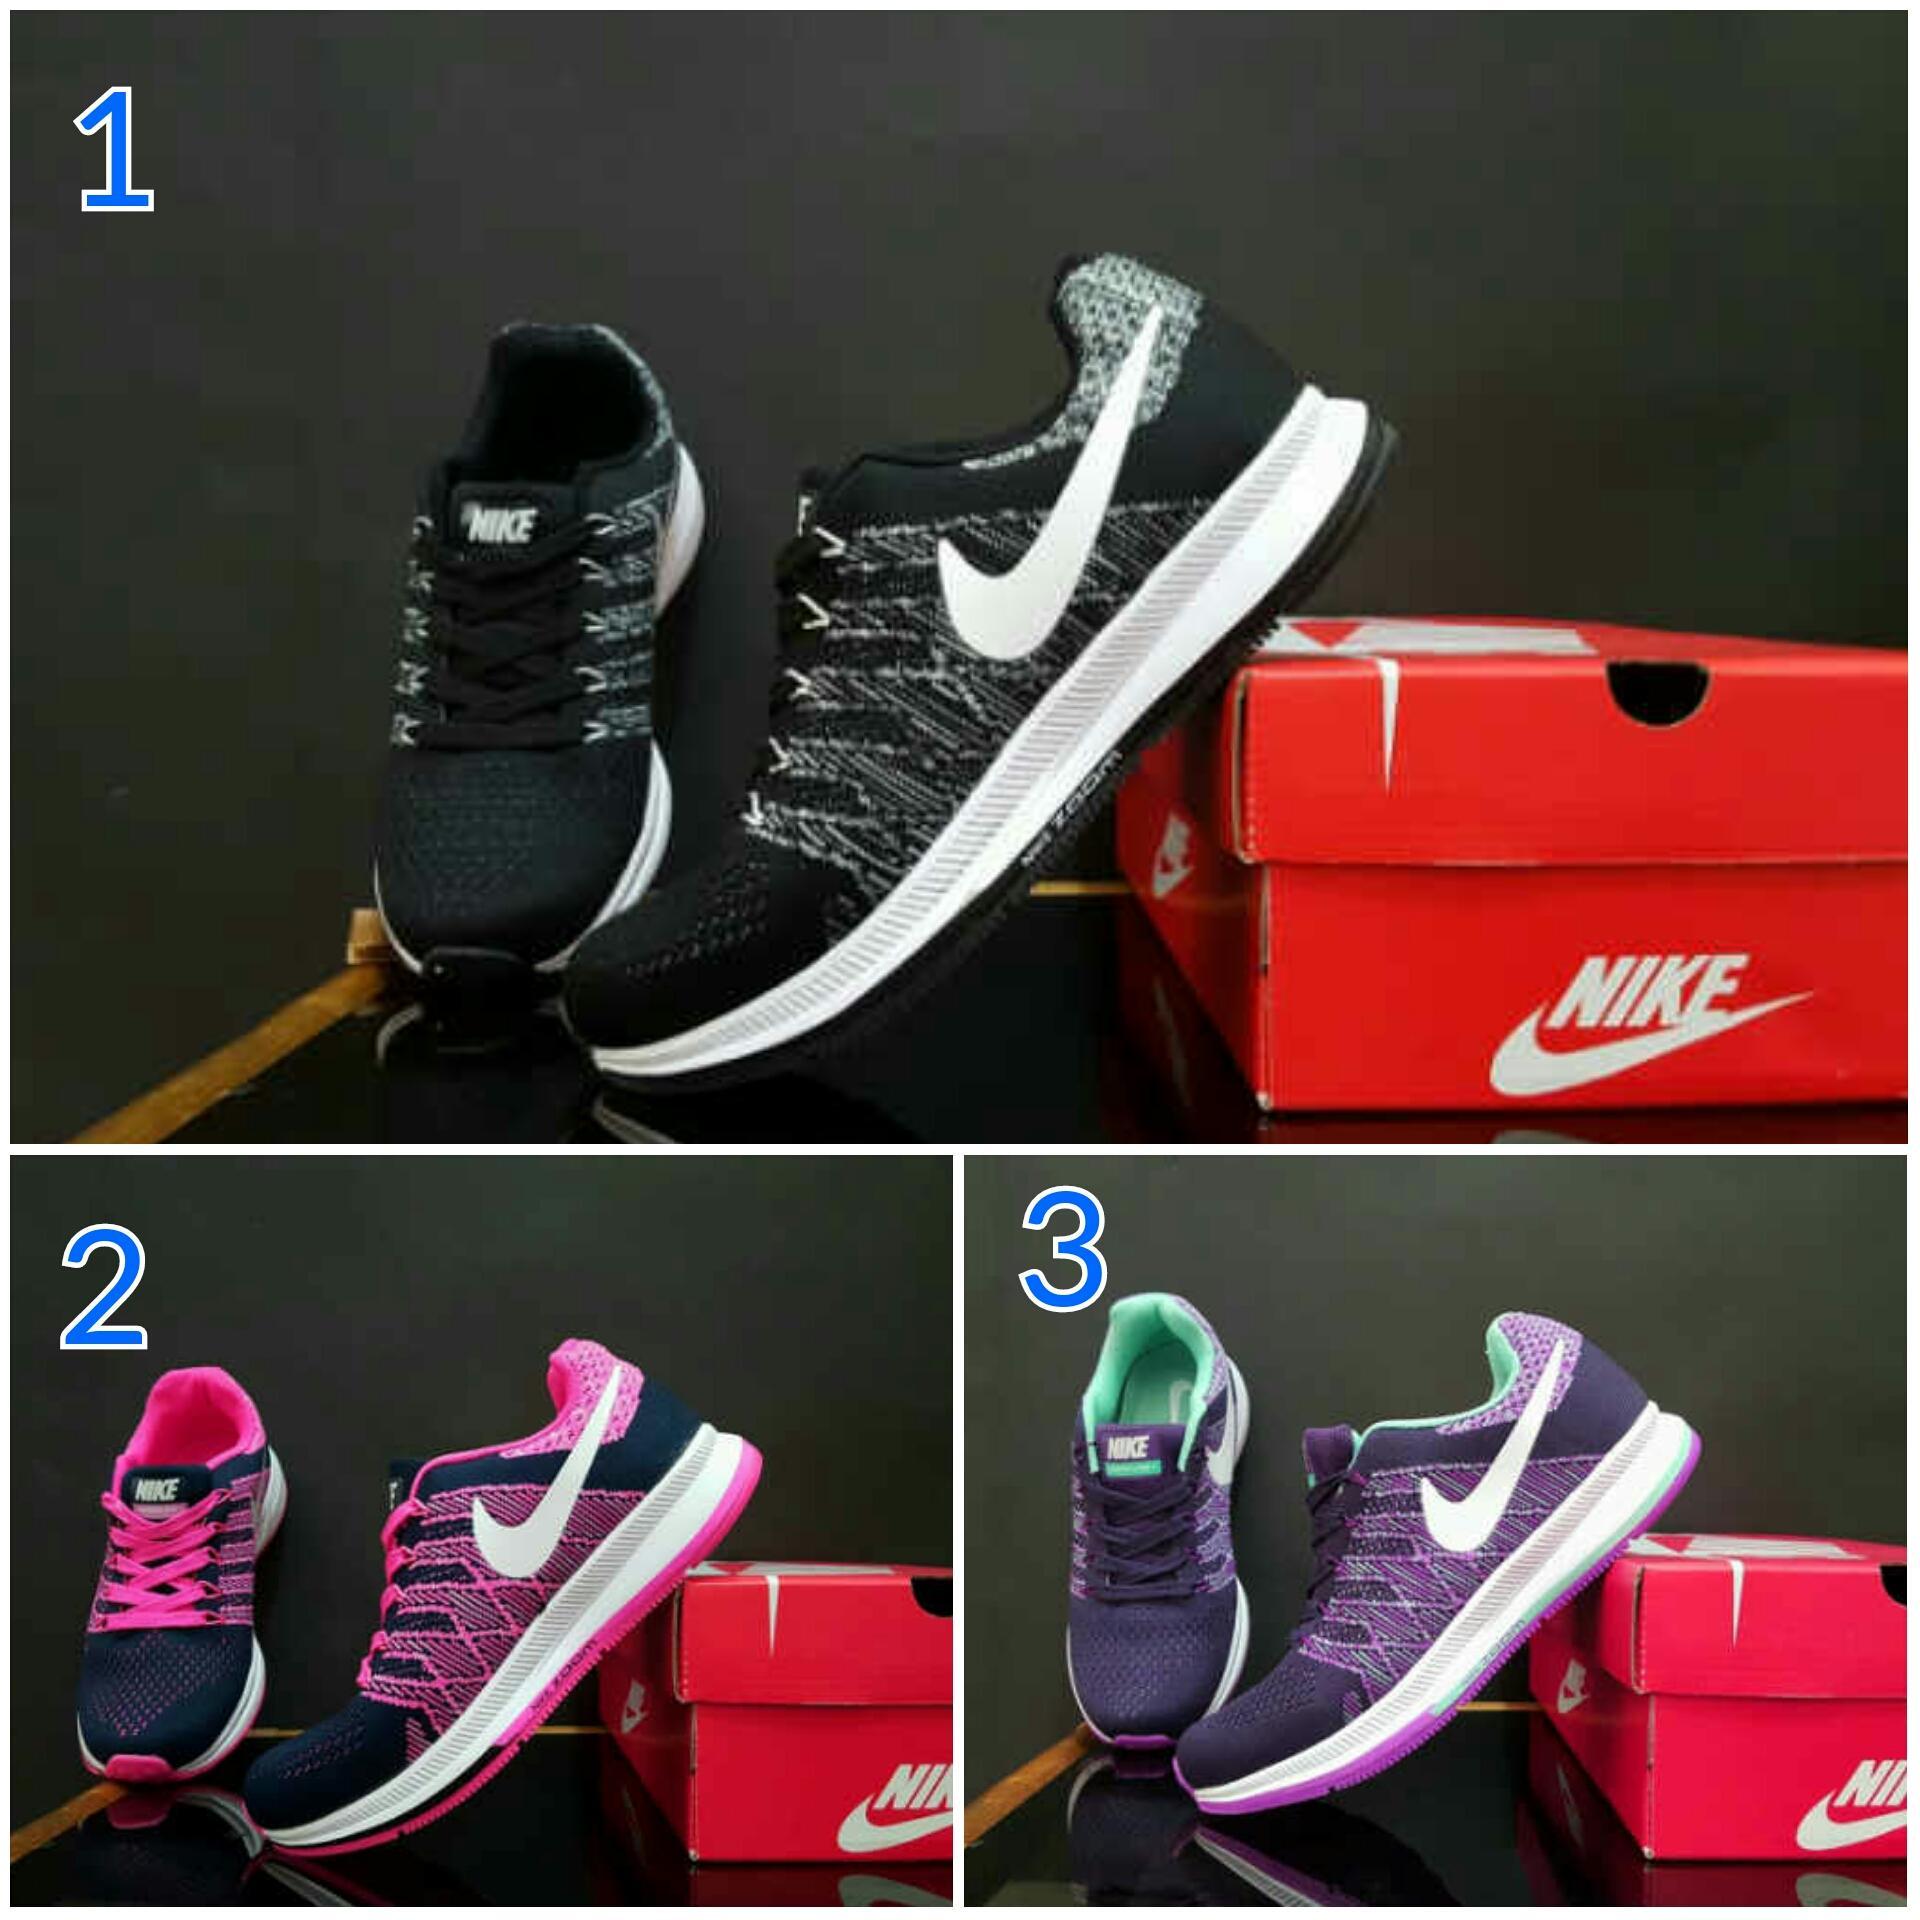 Promo Sepatu Wanita Olahraga Fitnes Nike Zoom Flyknite Made In Vietnam Murah Fashion